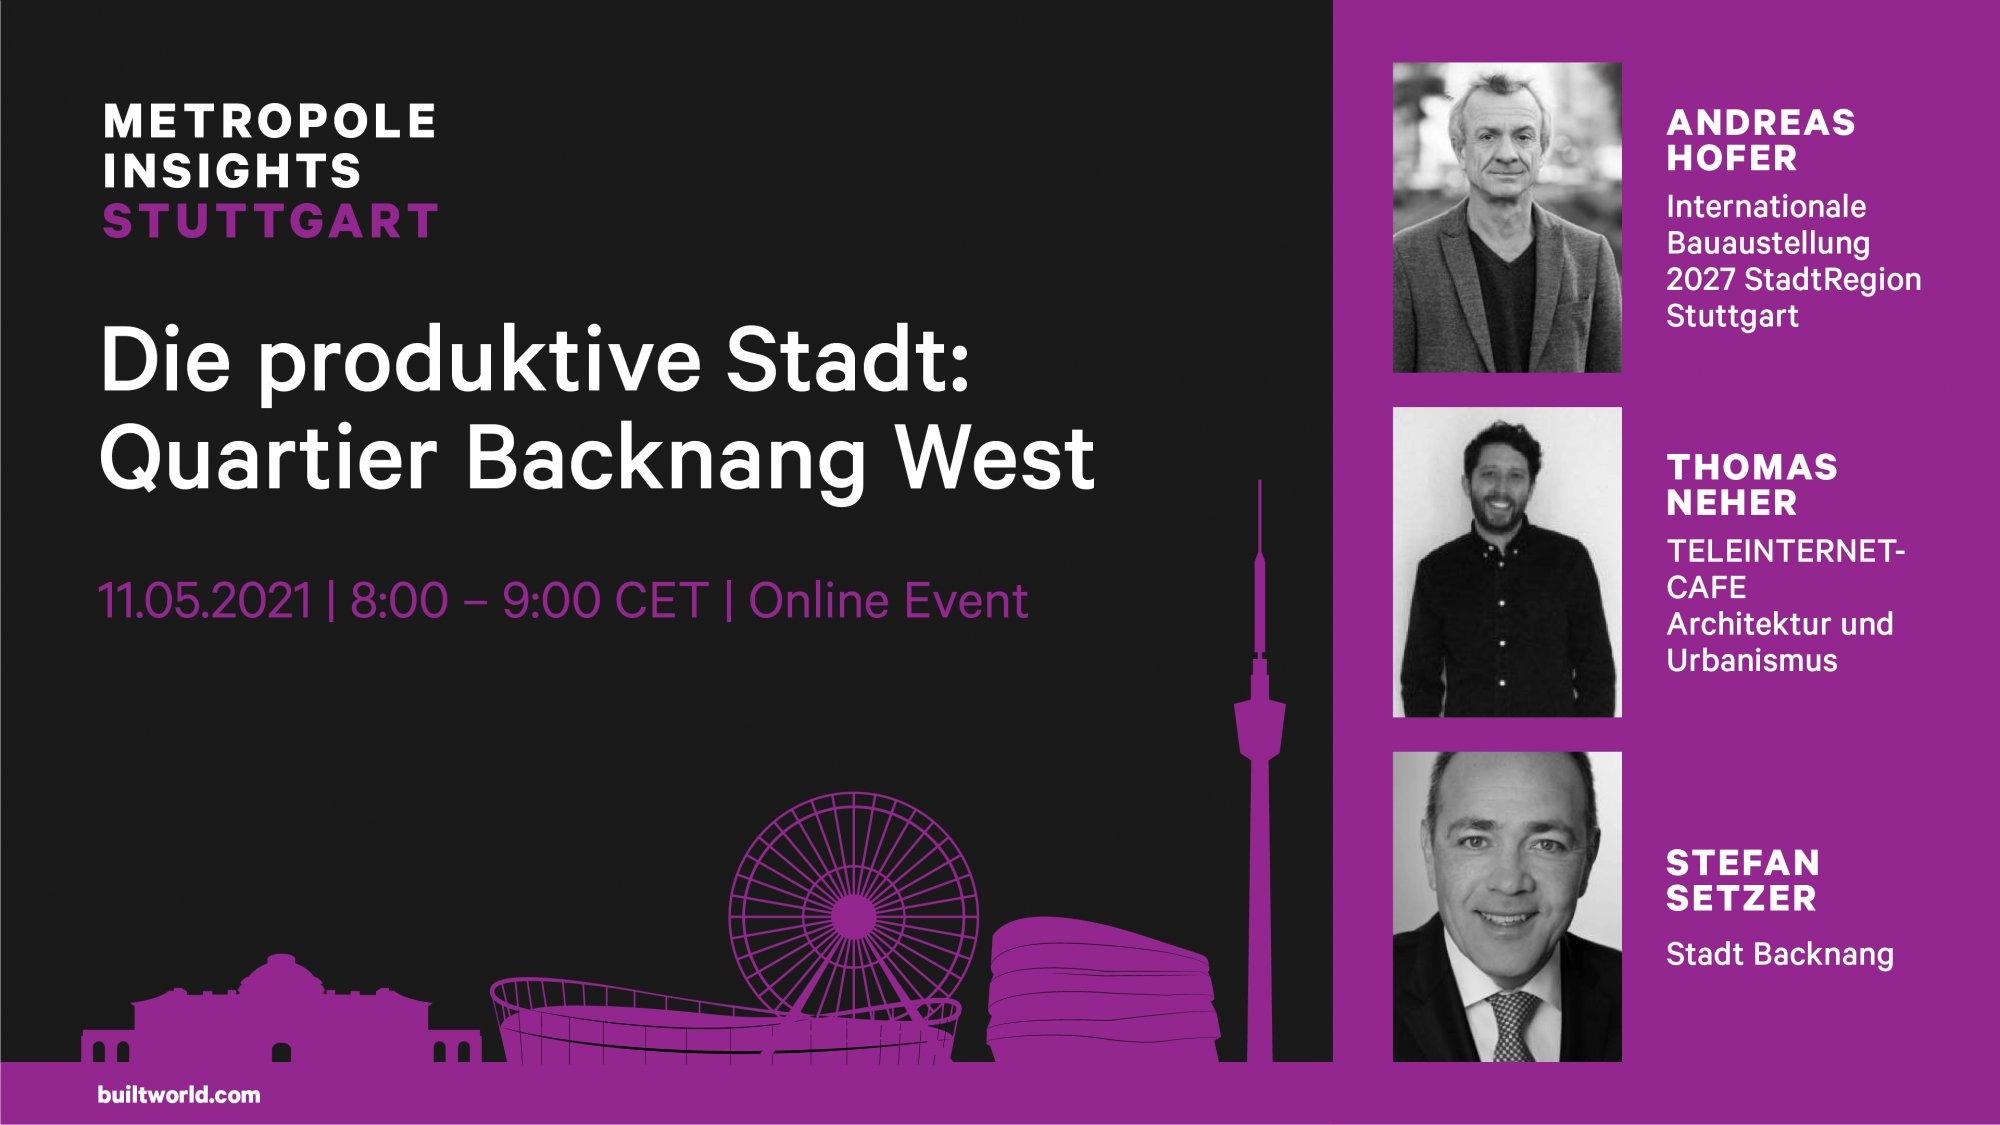 metropole-insights-stuttgart-die-produktive-stadt-quartier-backnang-west